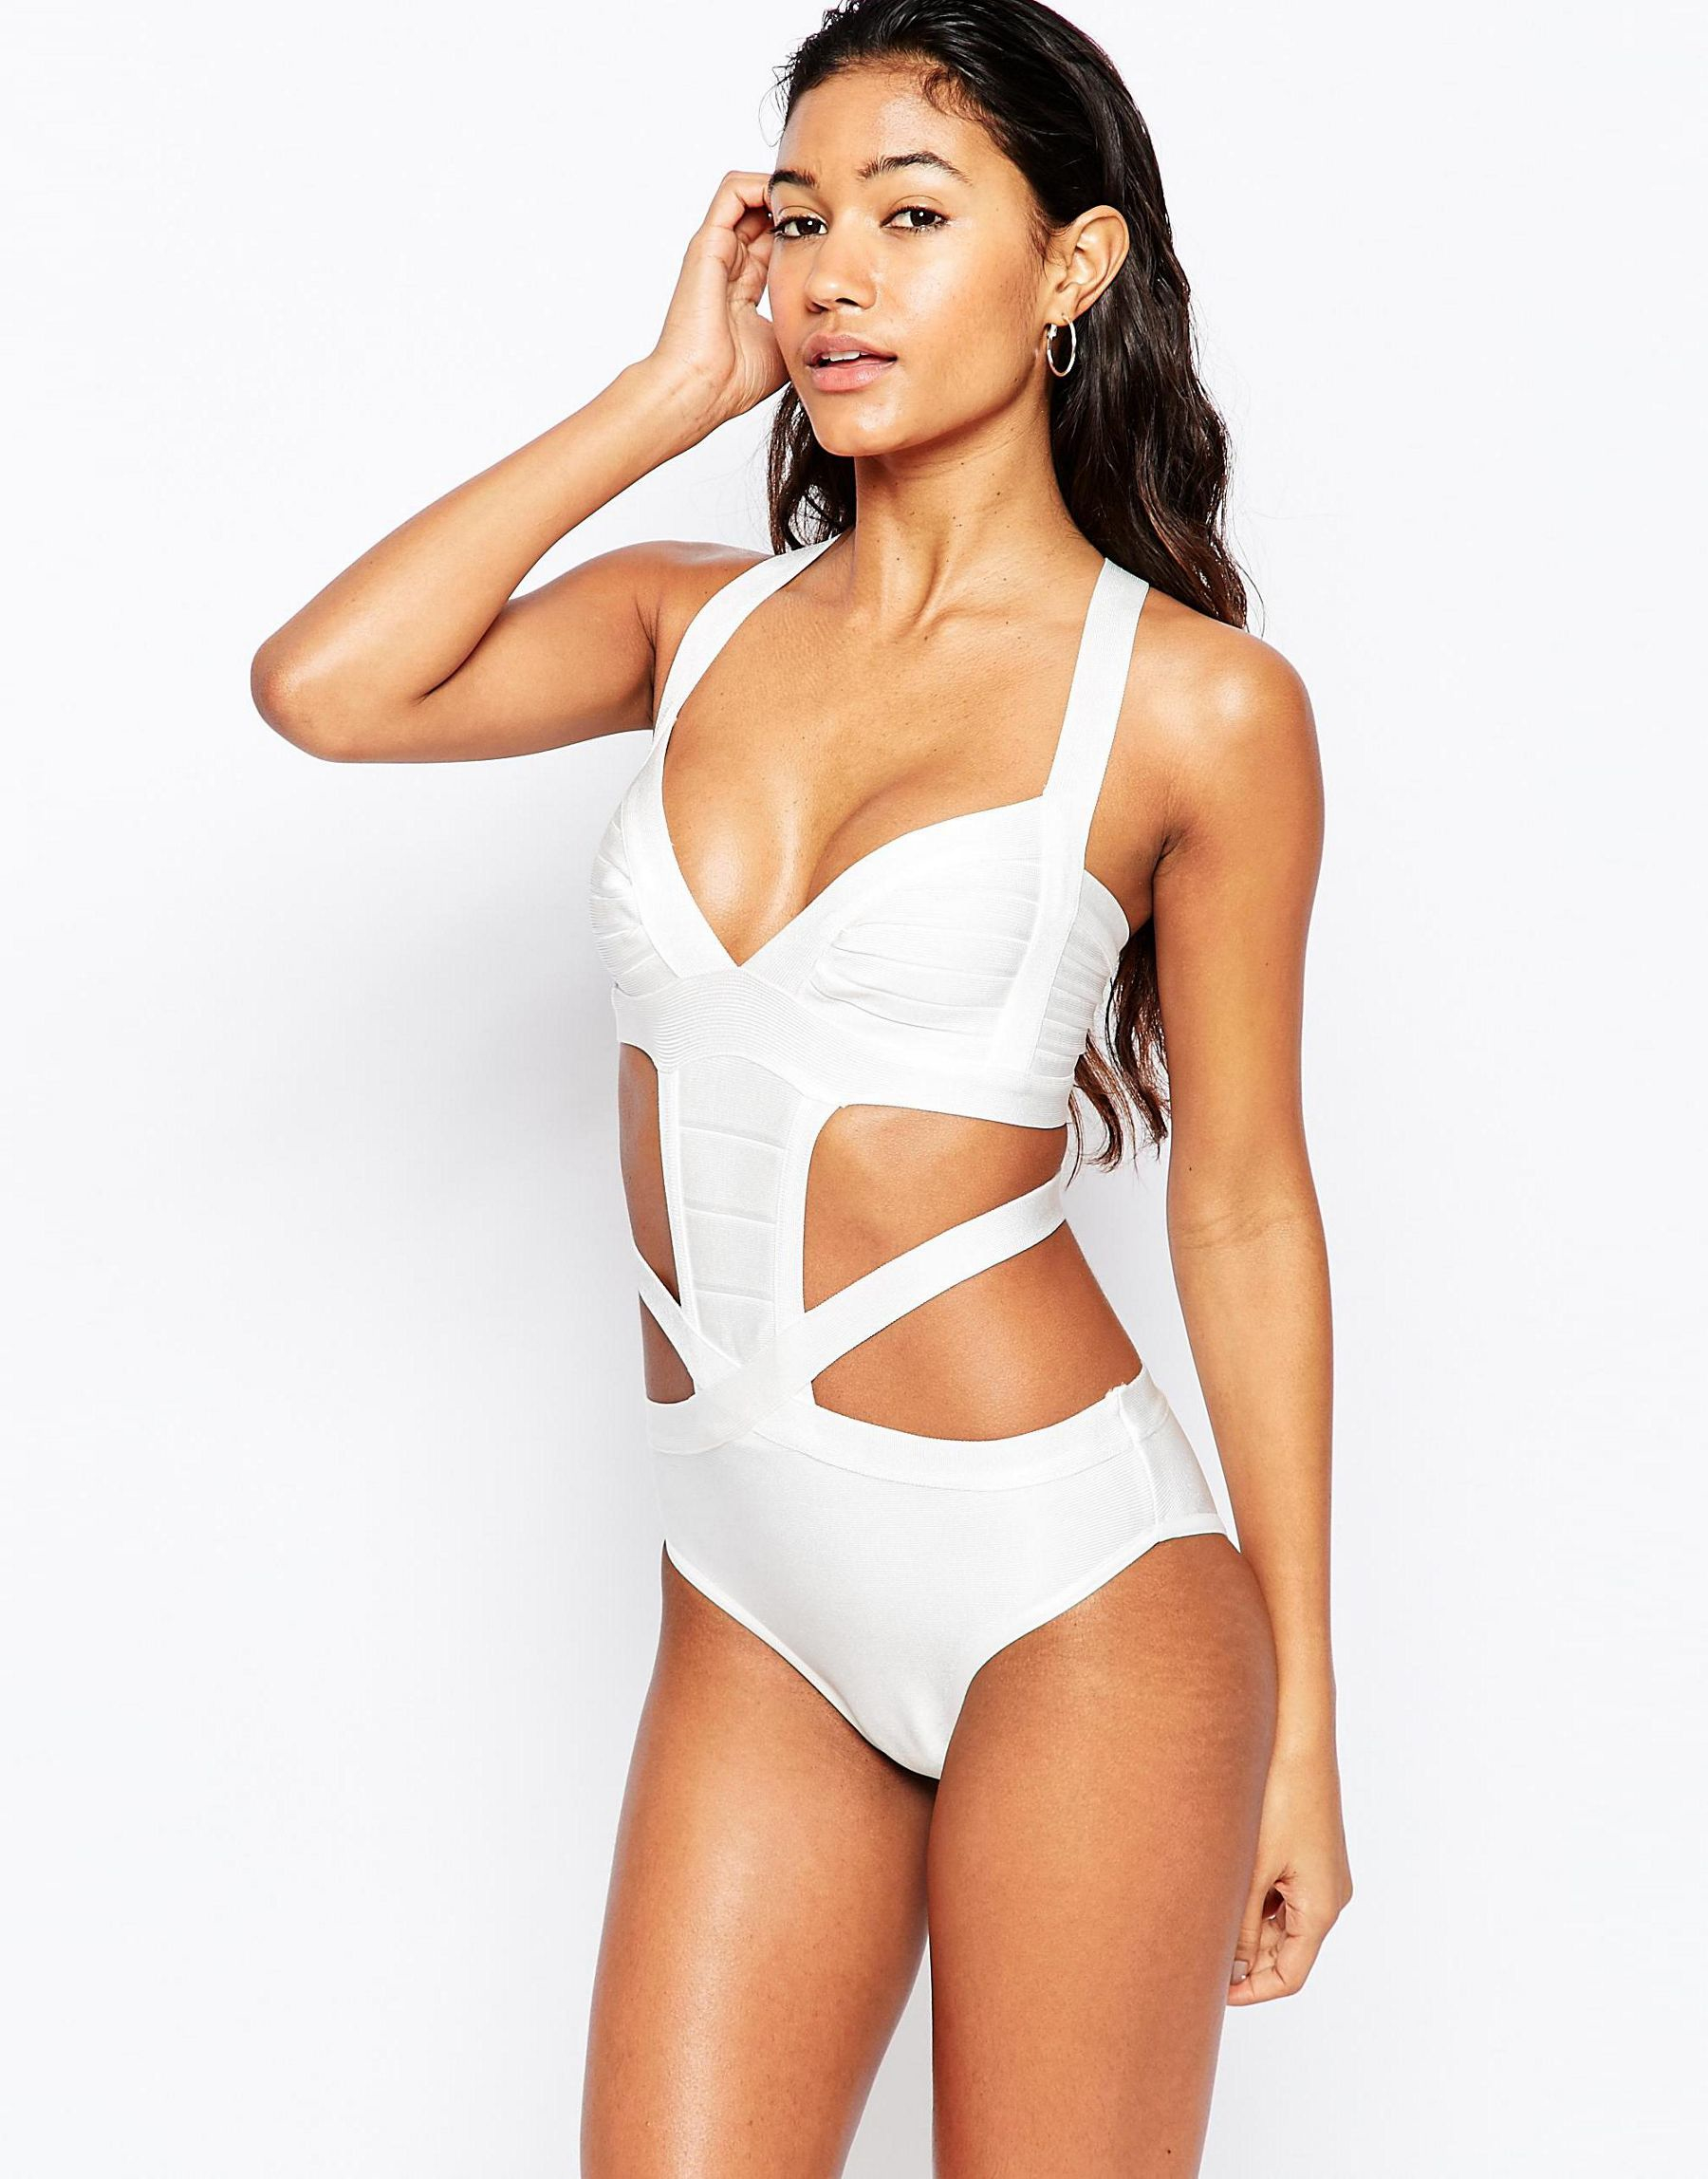 870cca22d32a5 Lyst - Little Mistress Cut Away Bandage Swimsuit in White